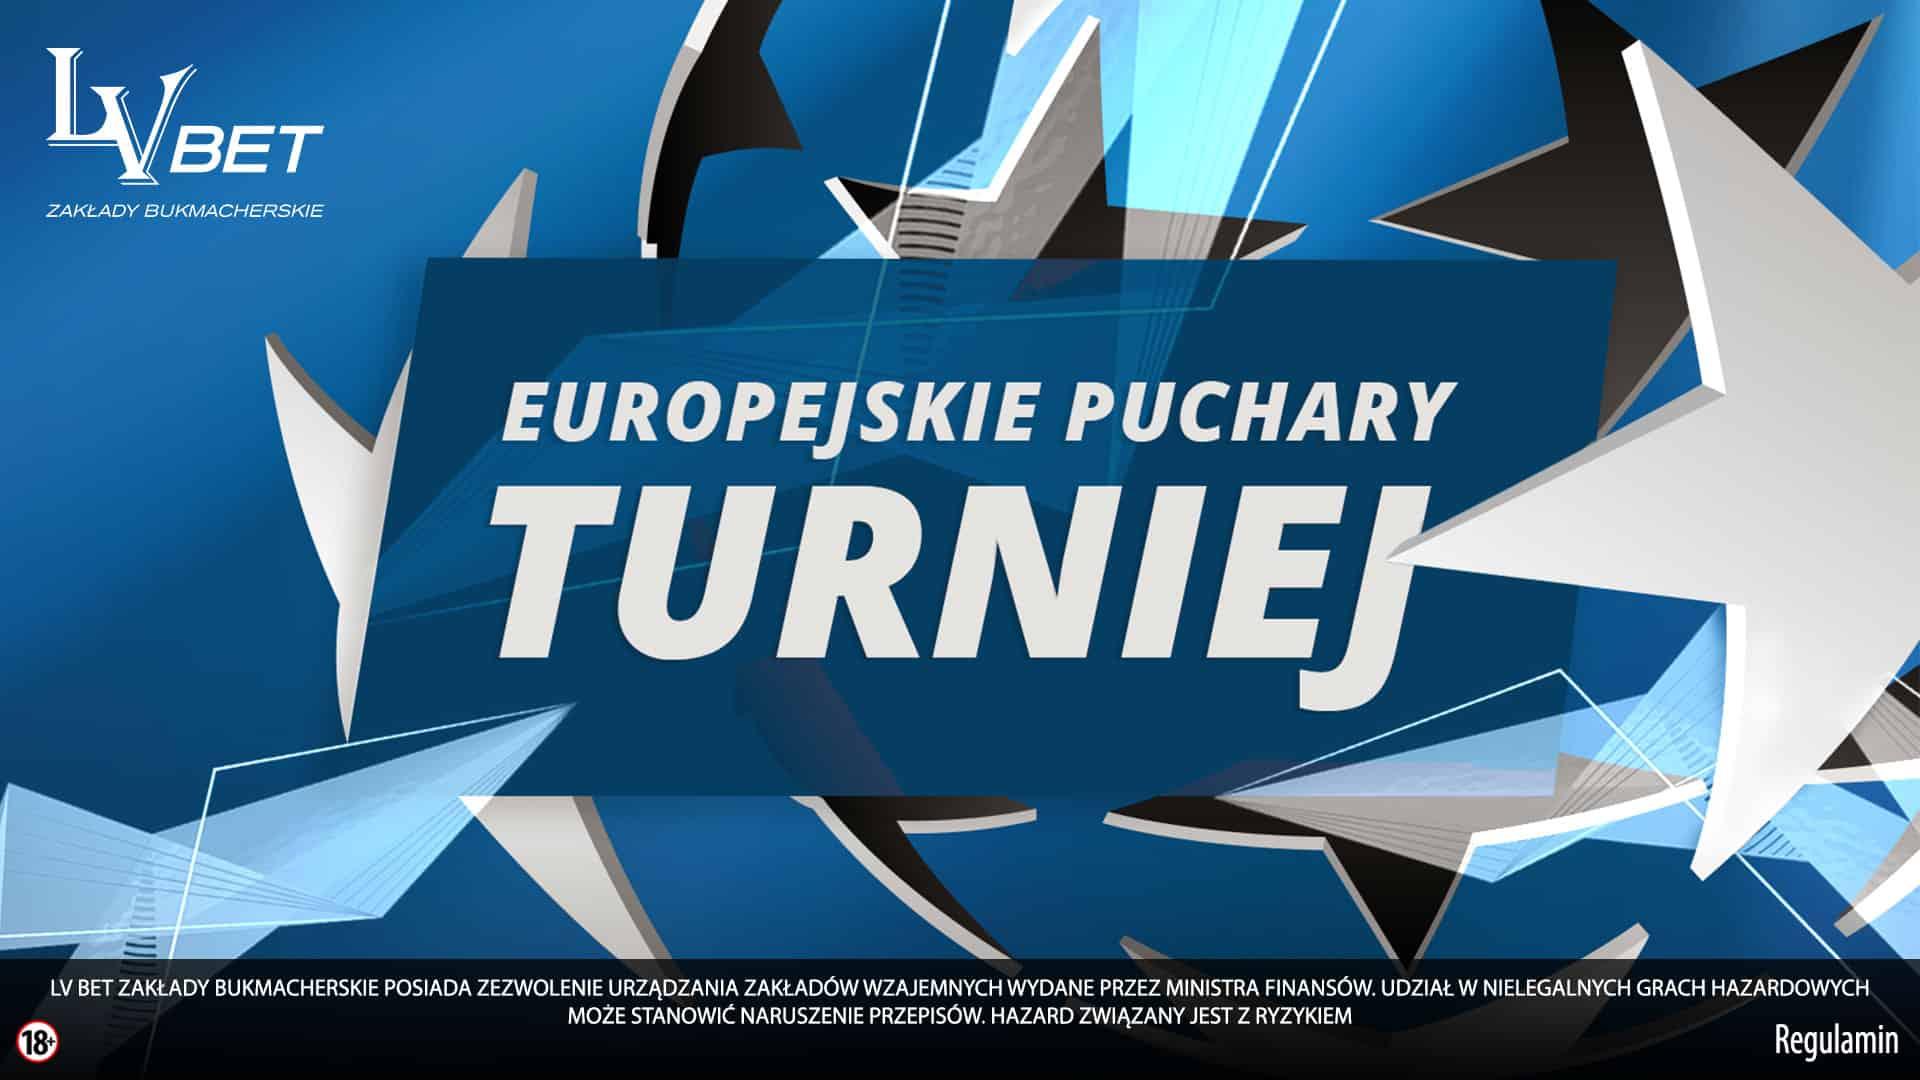 Konkurs na europejskie puchary. 600 PLN od LVBet!